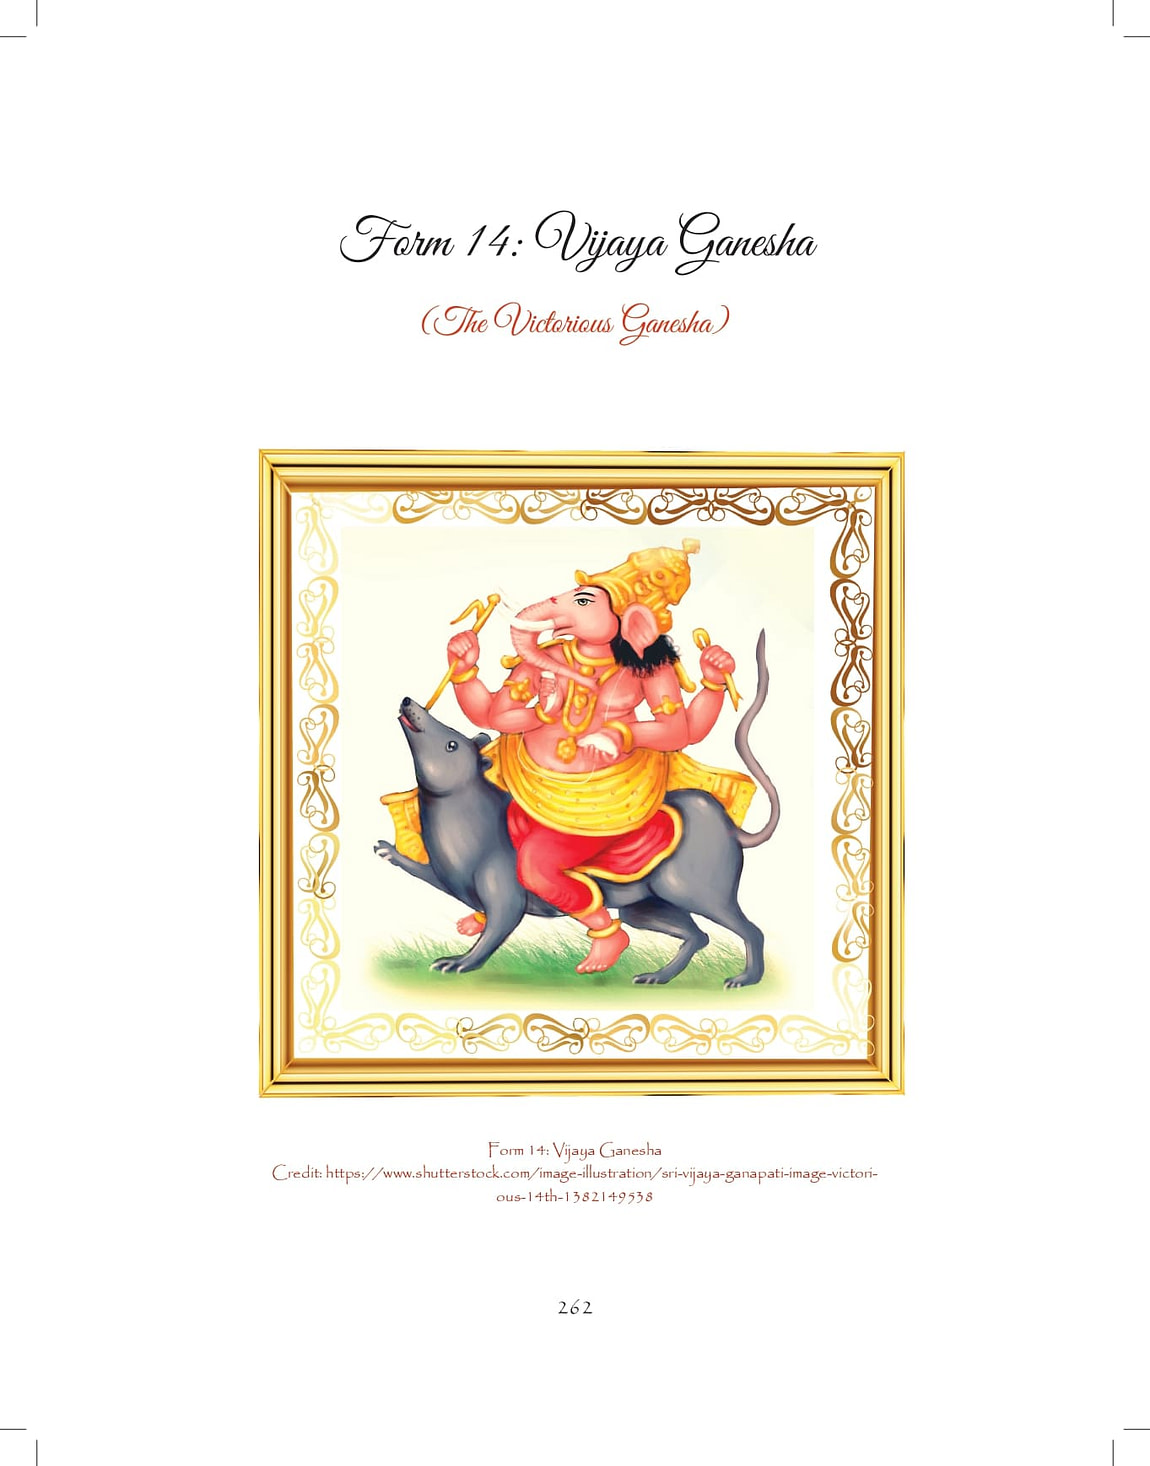 Ganesh-print_pages-to-jpg-0262.jpg